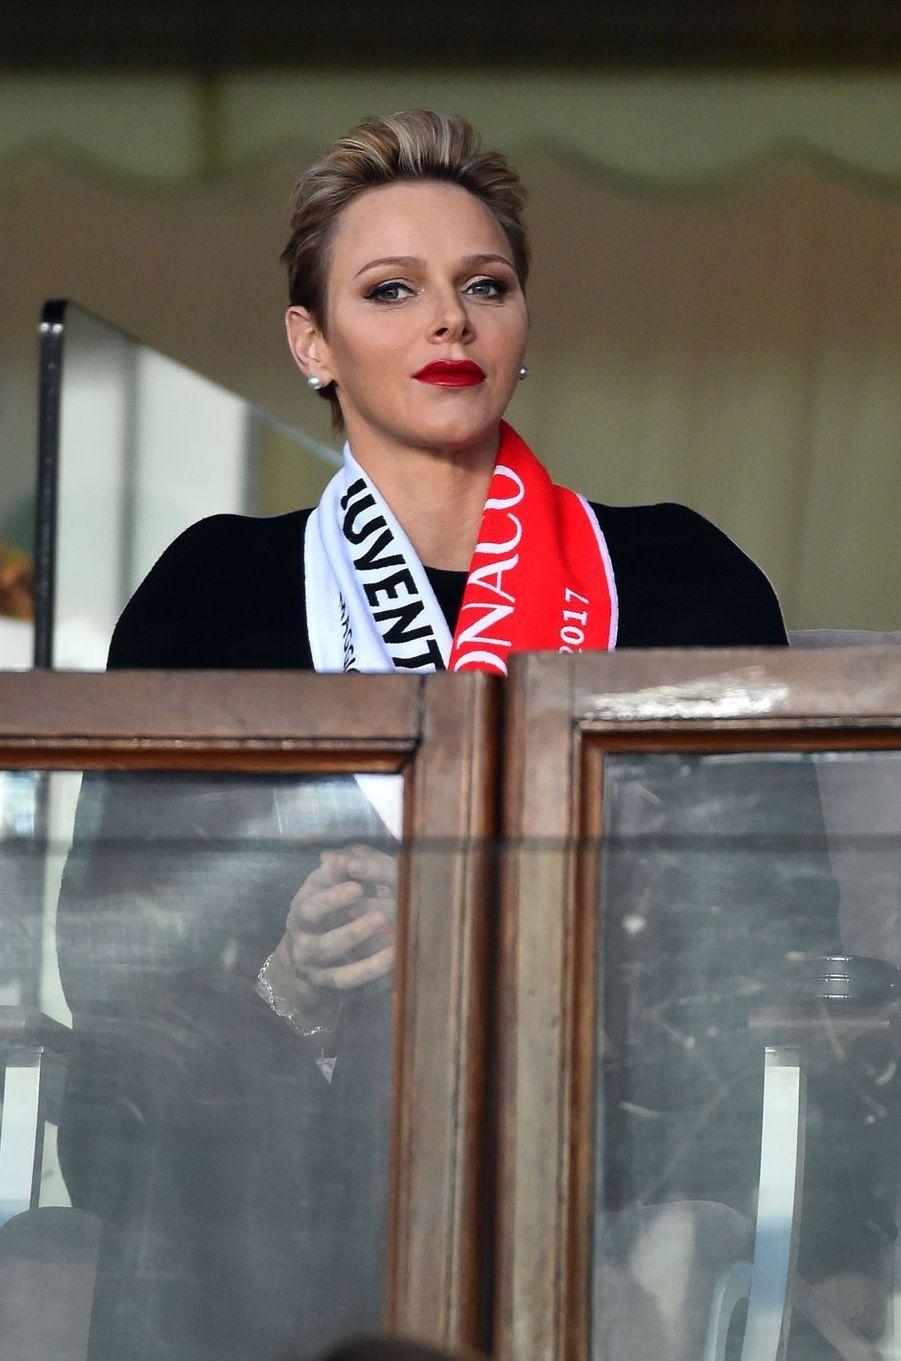 La princesse Charlène de Monaco au stade Louis-II à Monaco, le 3 mai 2017